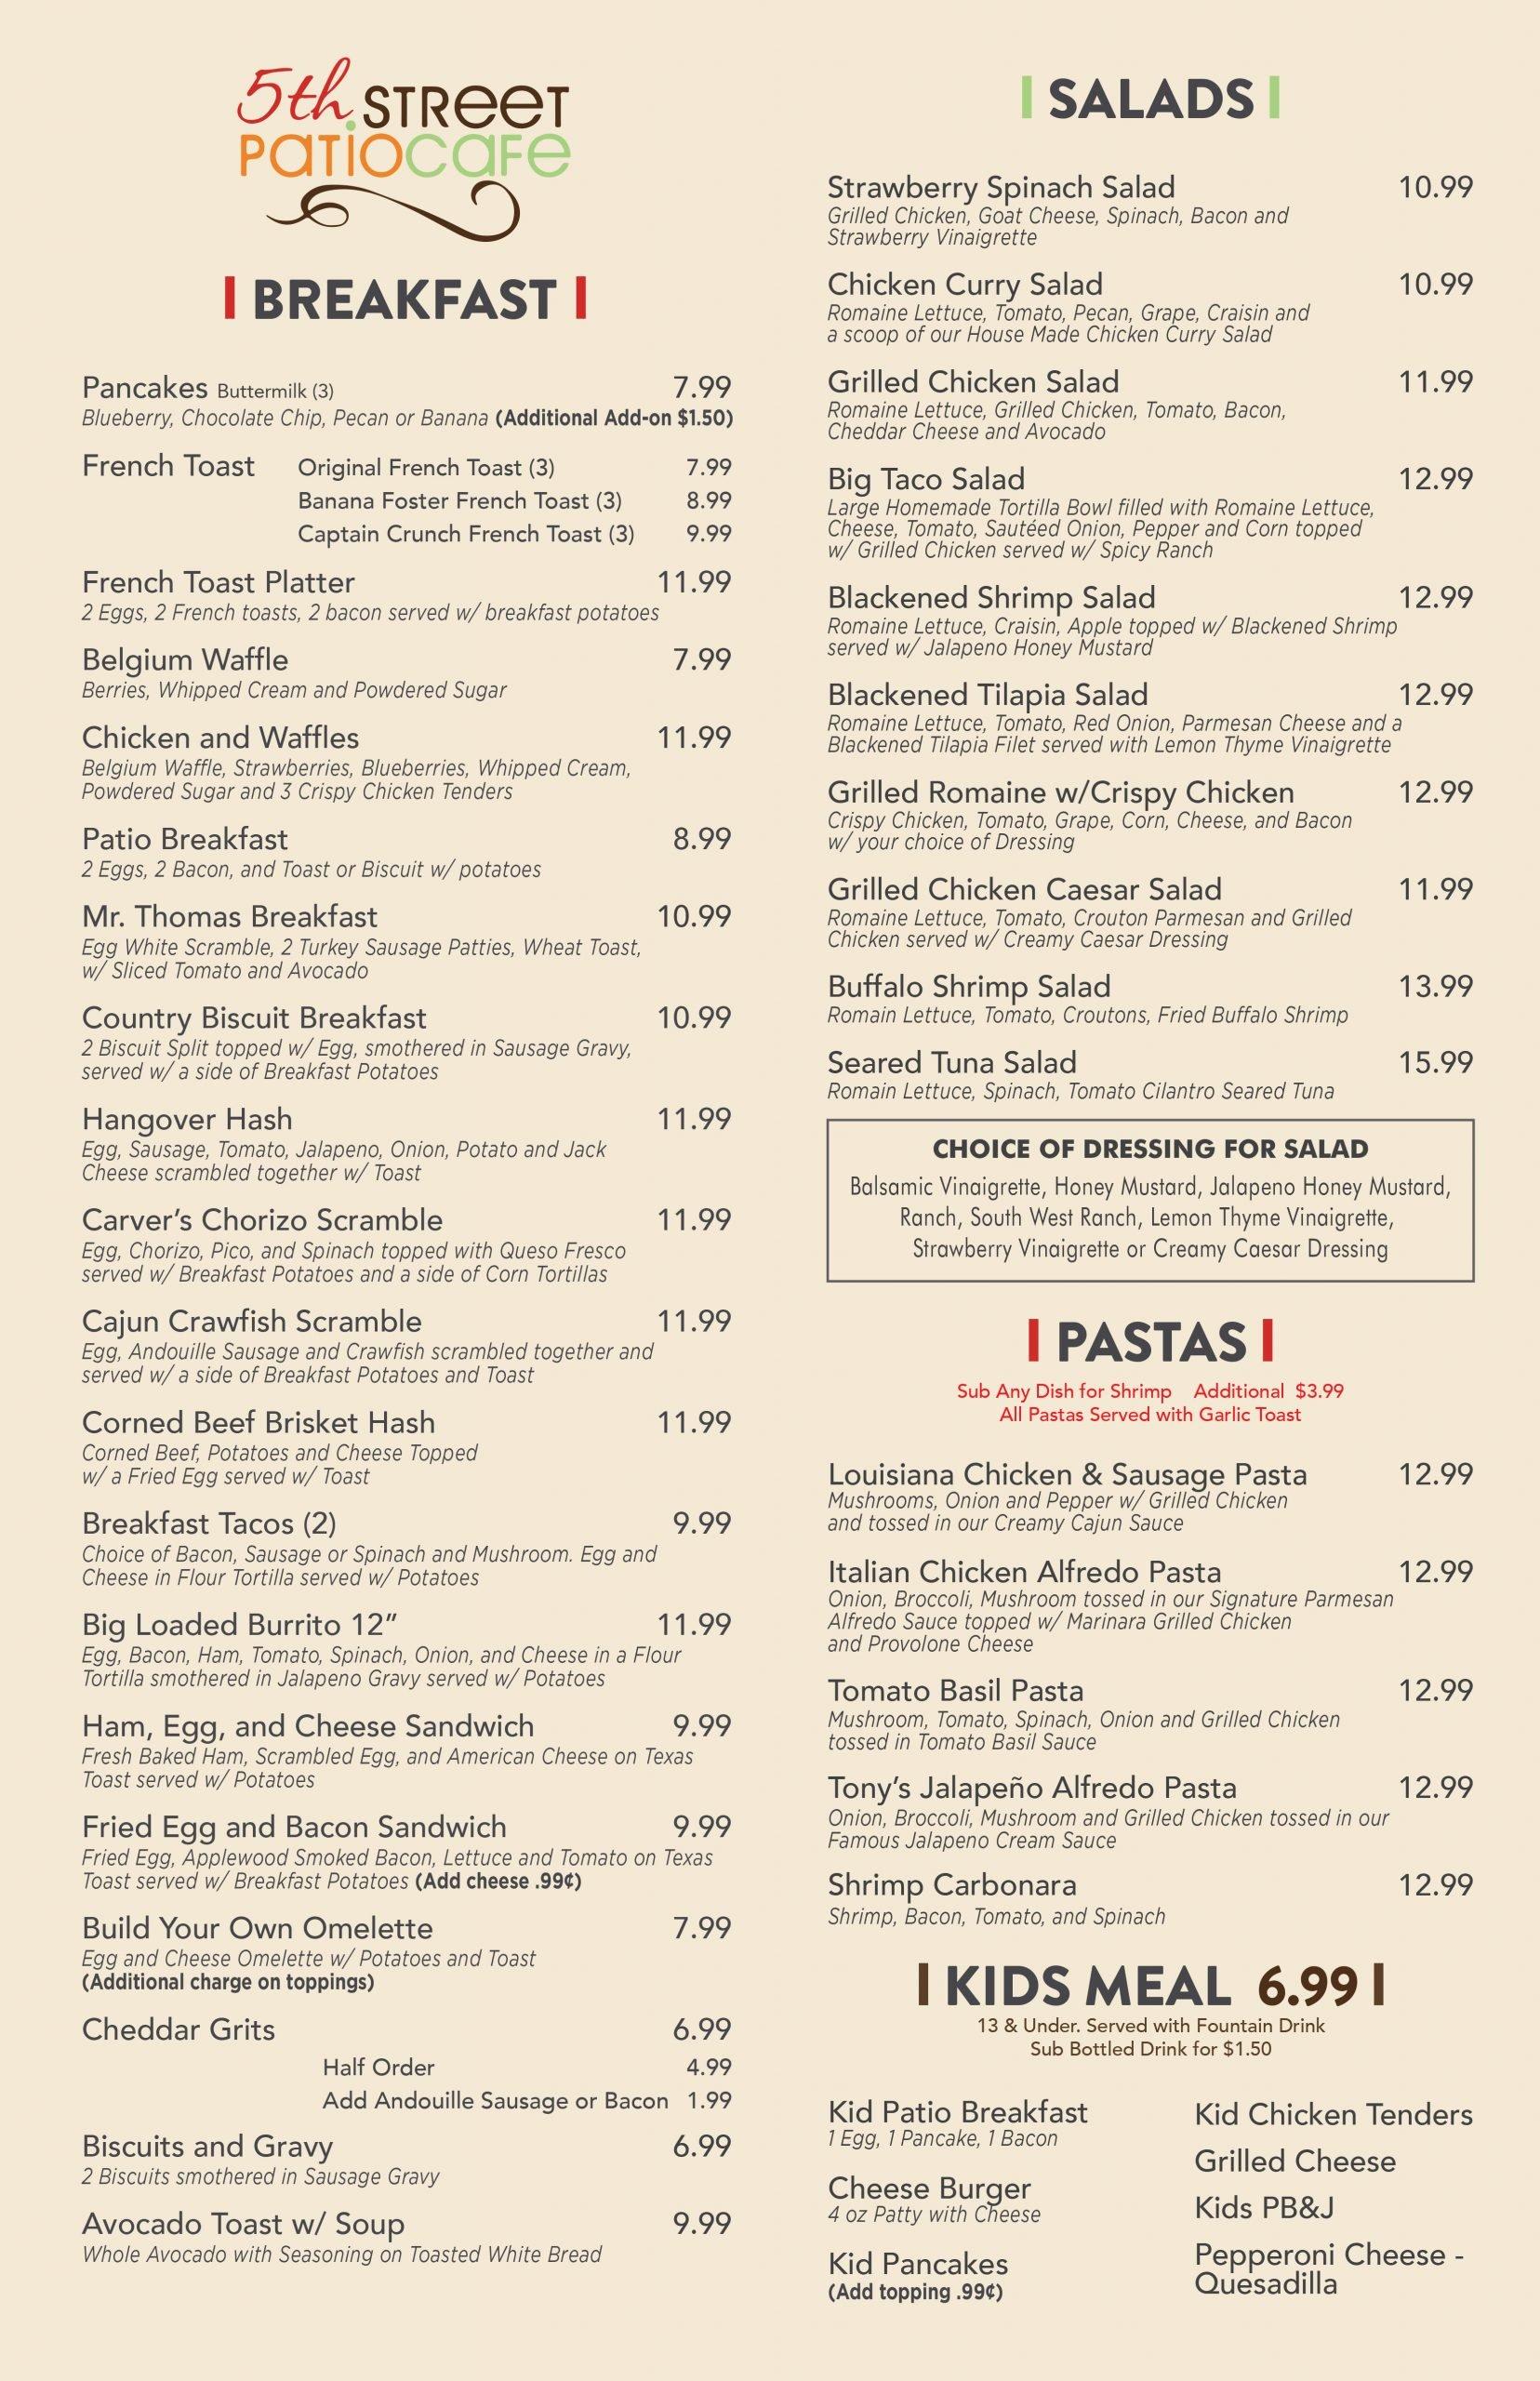 5thstreetcafe-menu-11x17-working-092821